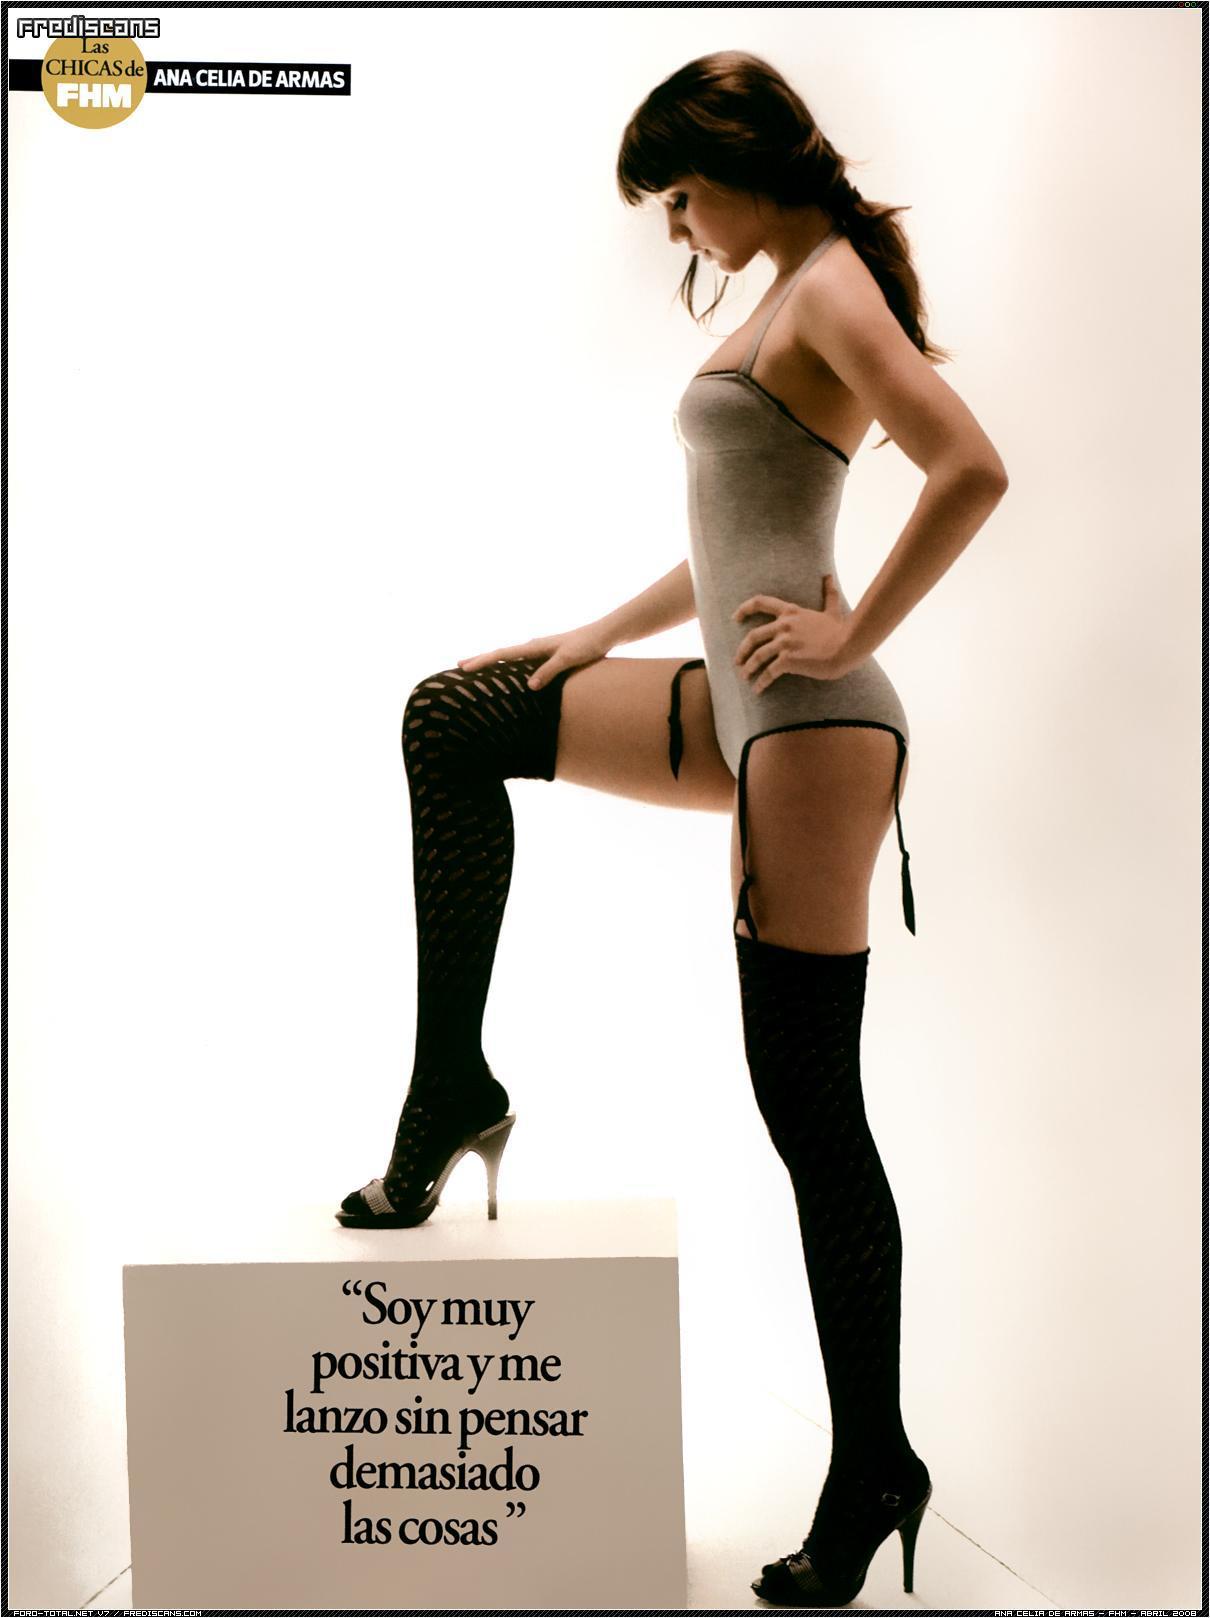 Ana Celia De Armas Sex fhm - pics of ana de armas in fhm - imperiodefamosas